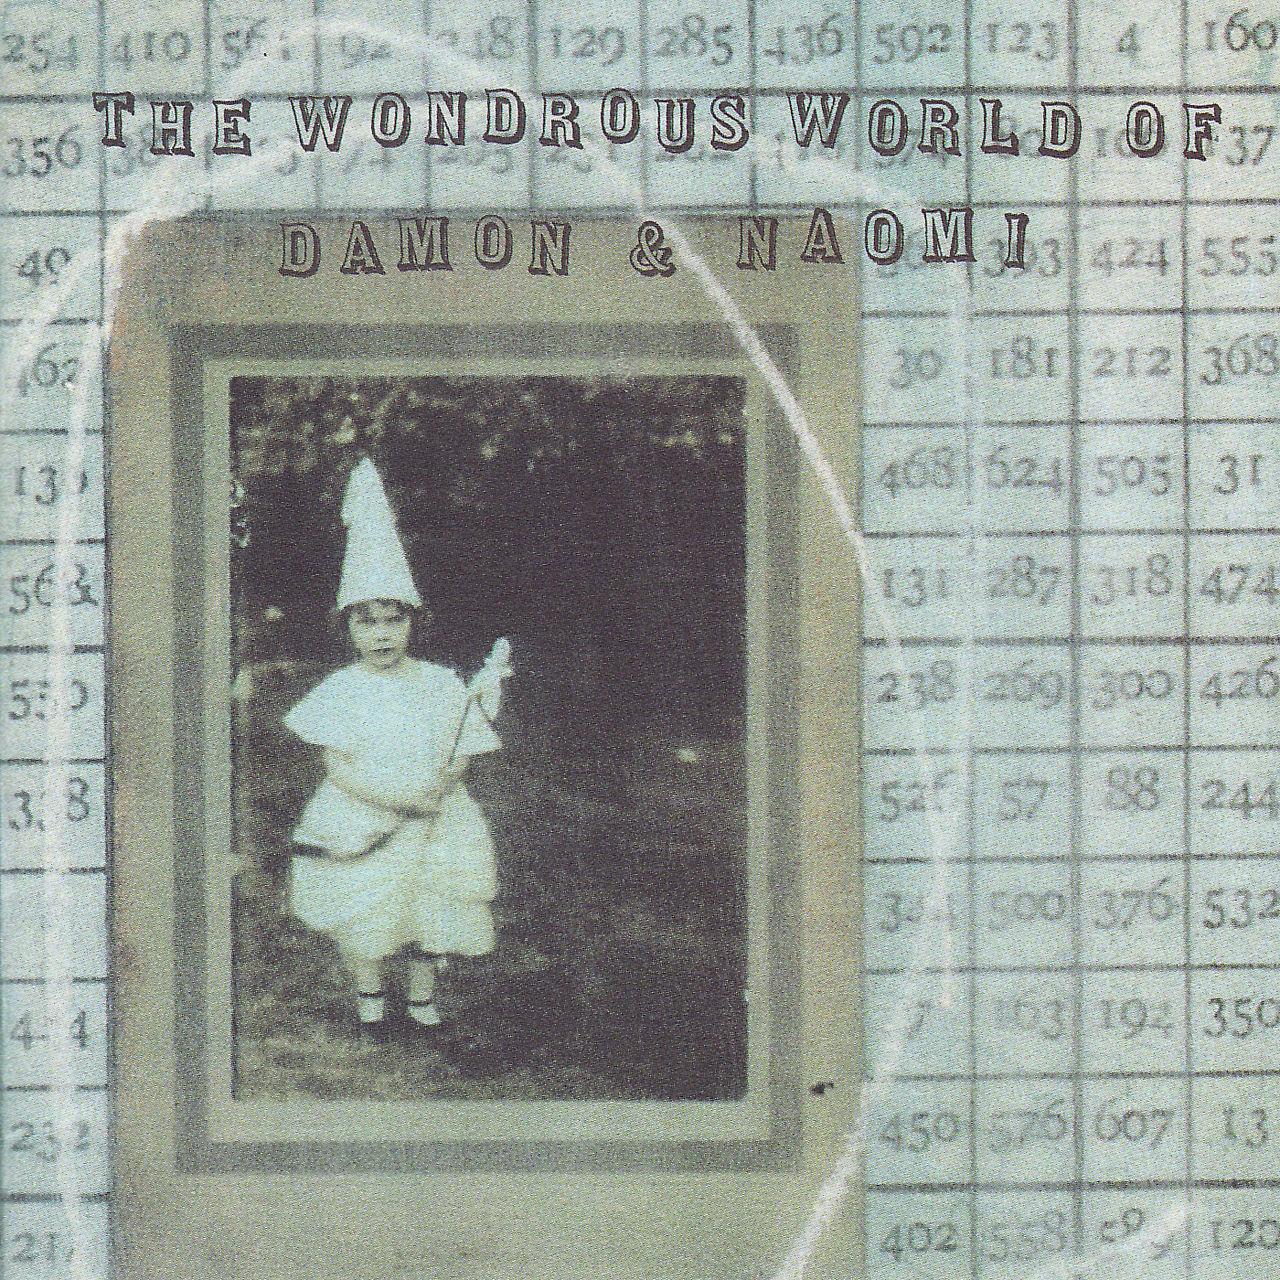 The Wondrous World of Damon & Naomi sleeve image